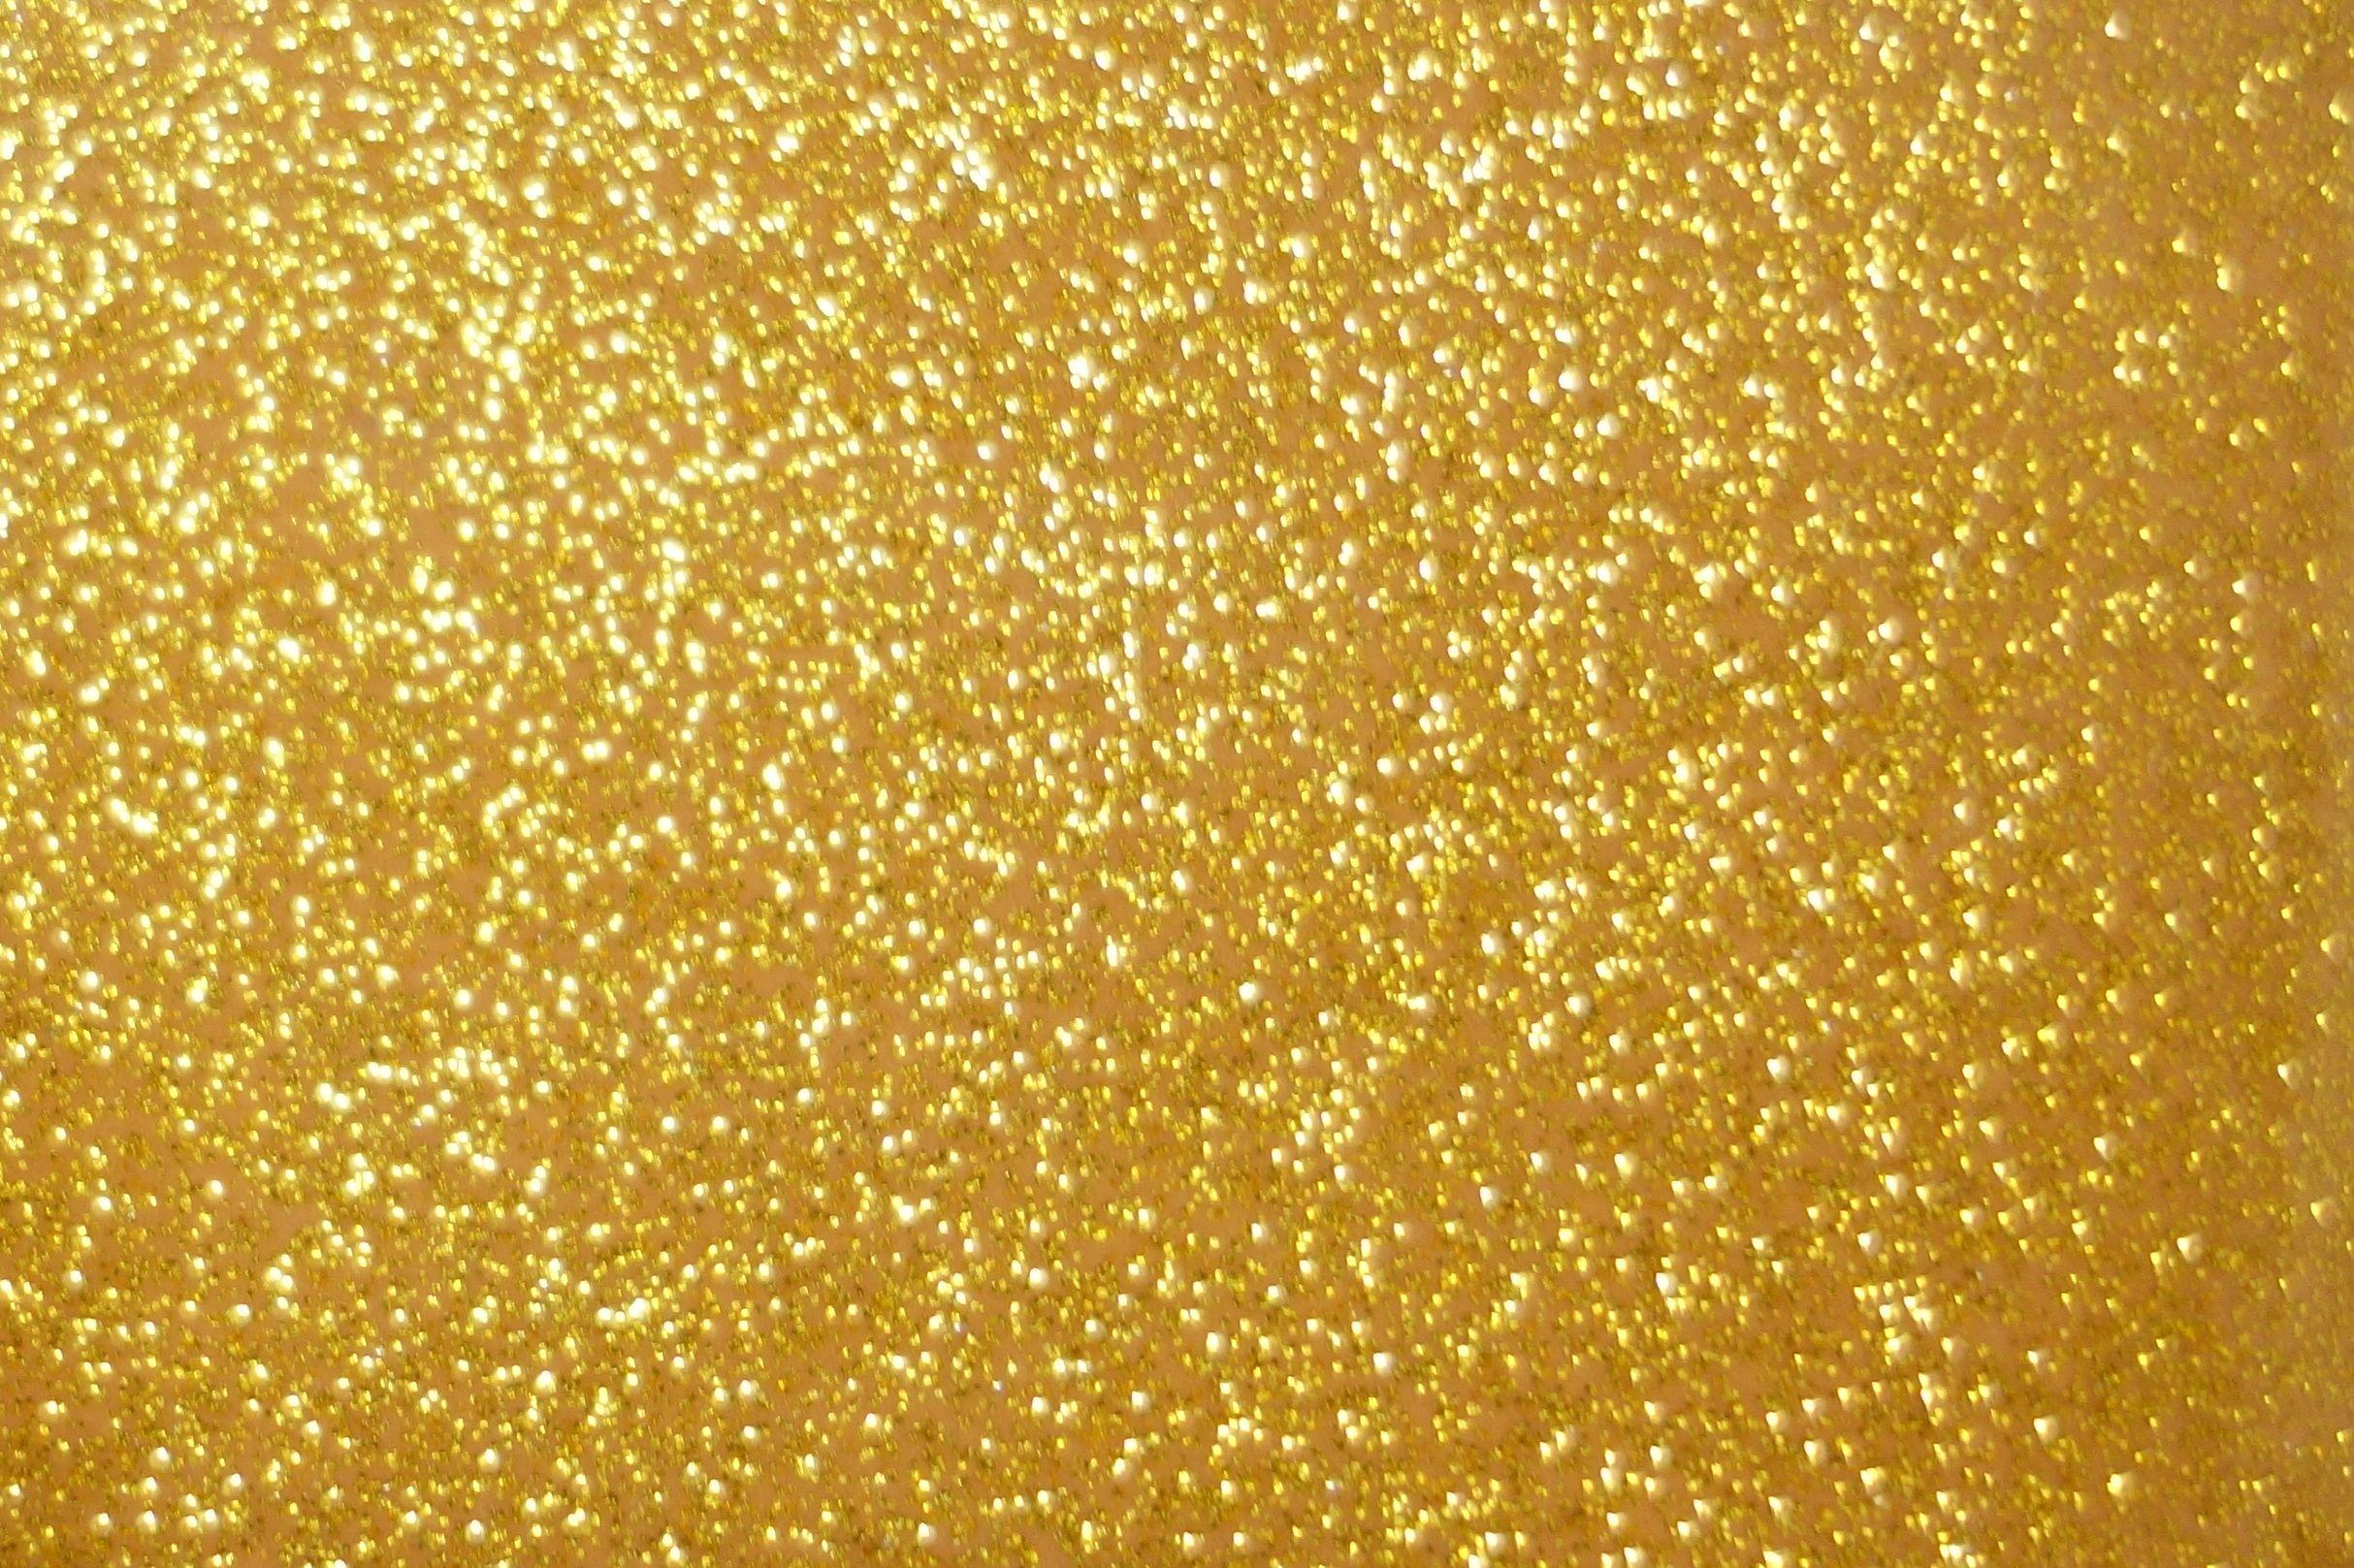 Glitter Texture Google Search Orc 16 Club R R